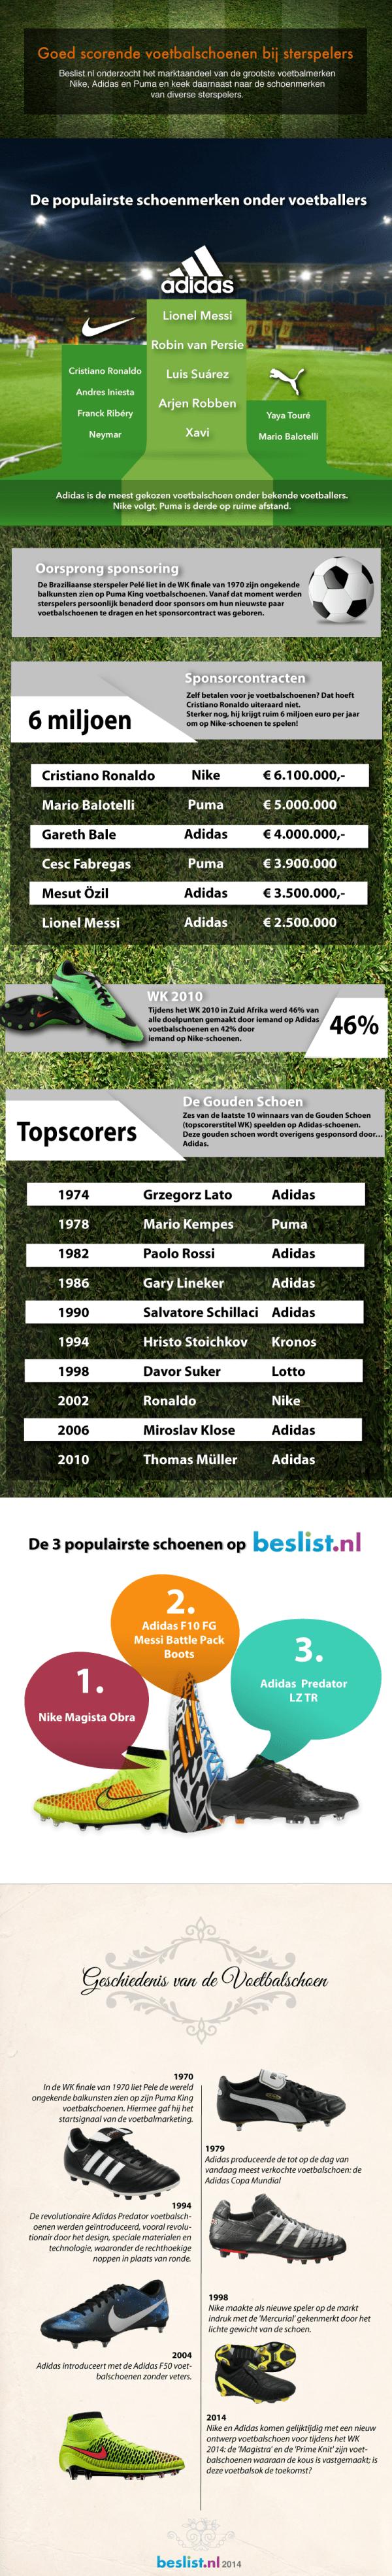 voetbal_infographic-600-beslist